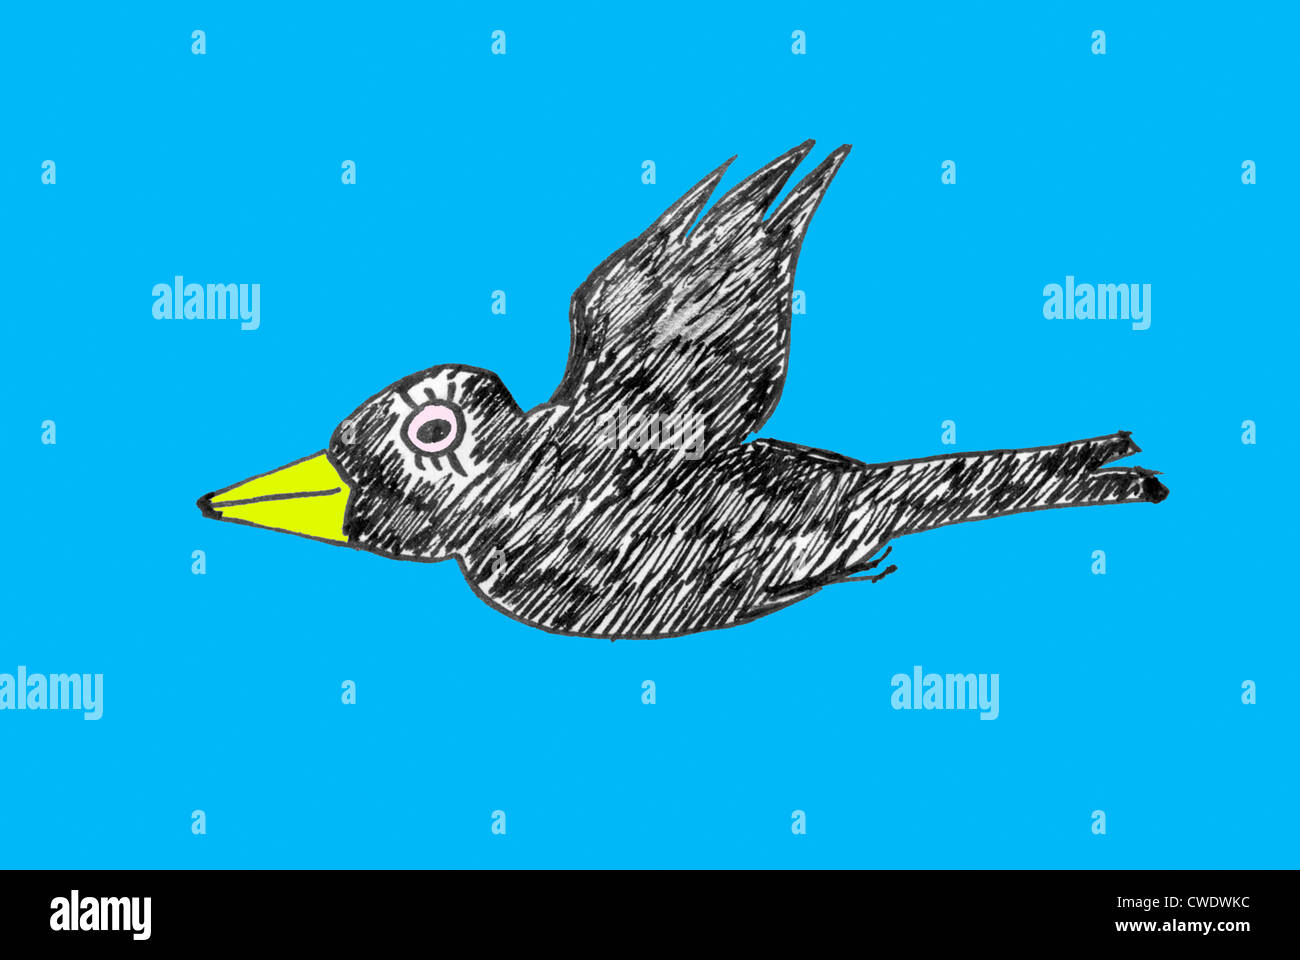 Flying bird cartoon black and white - photo#30